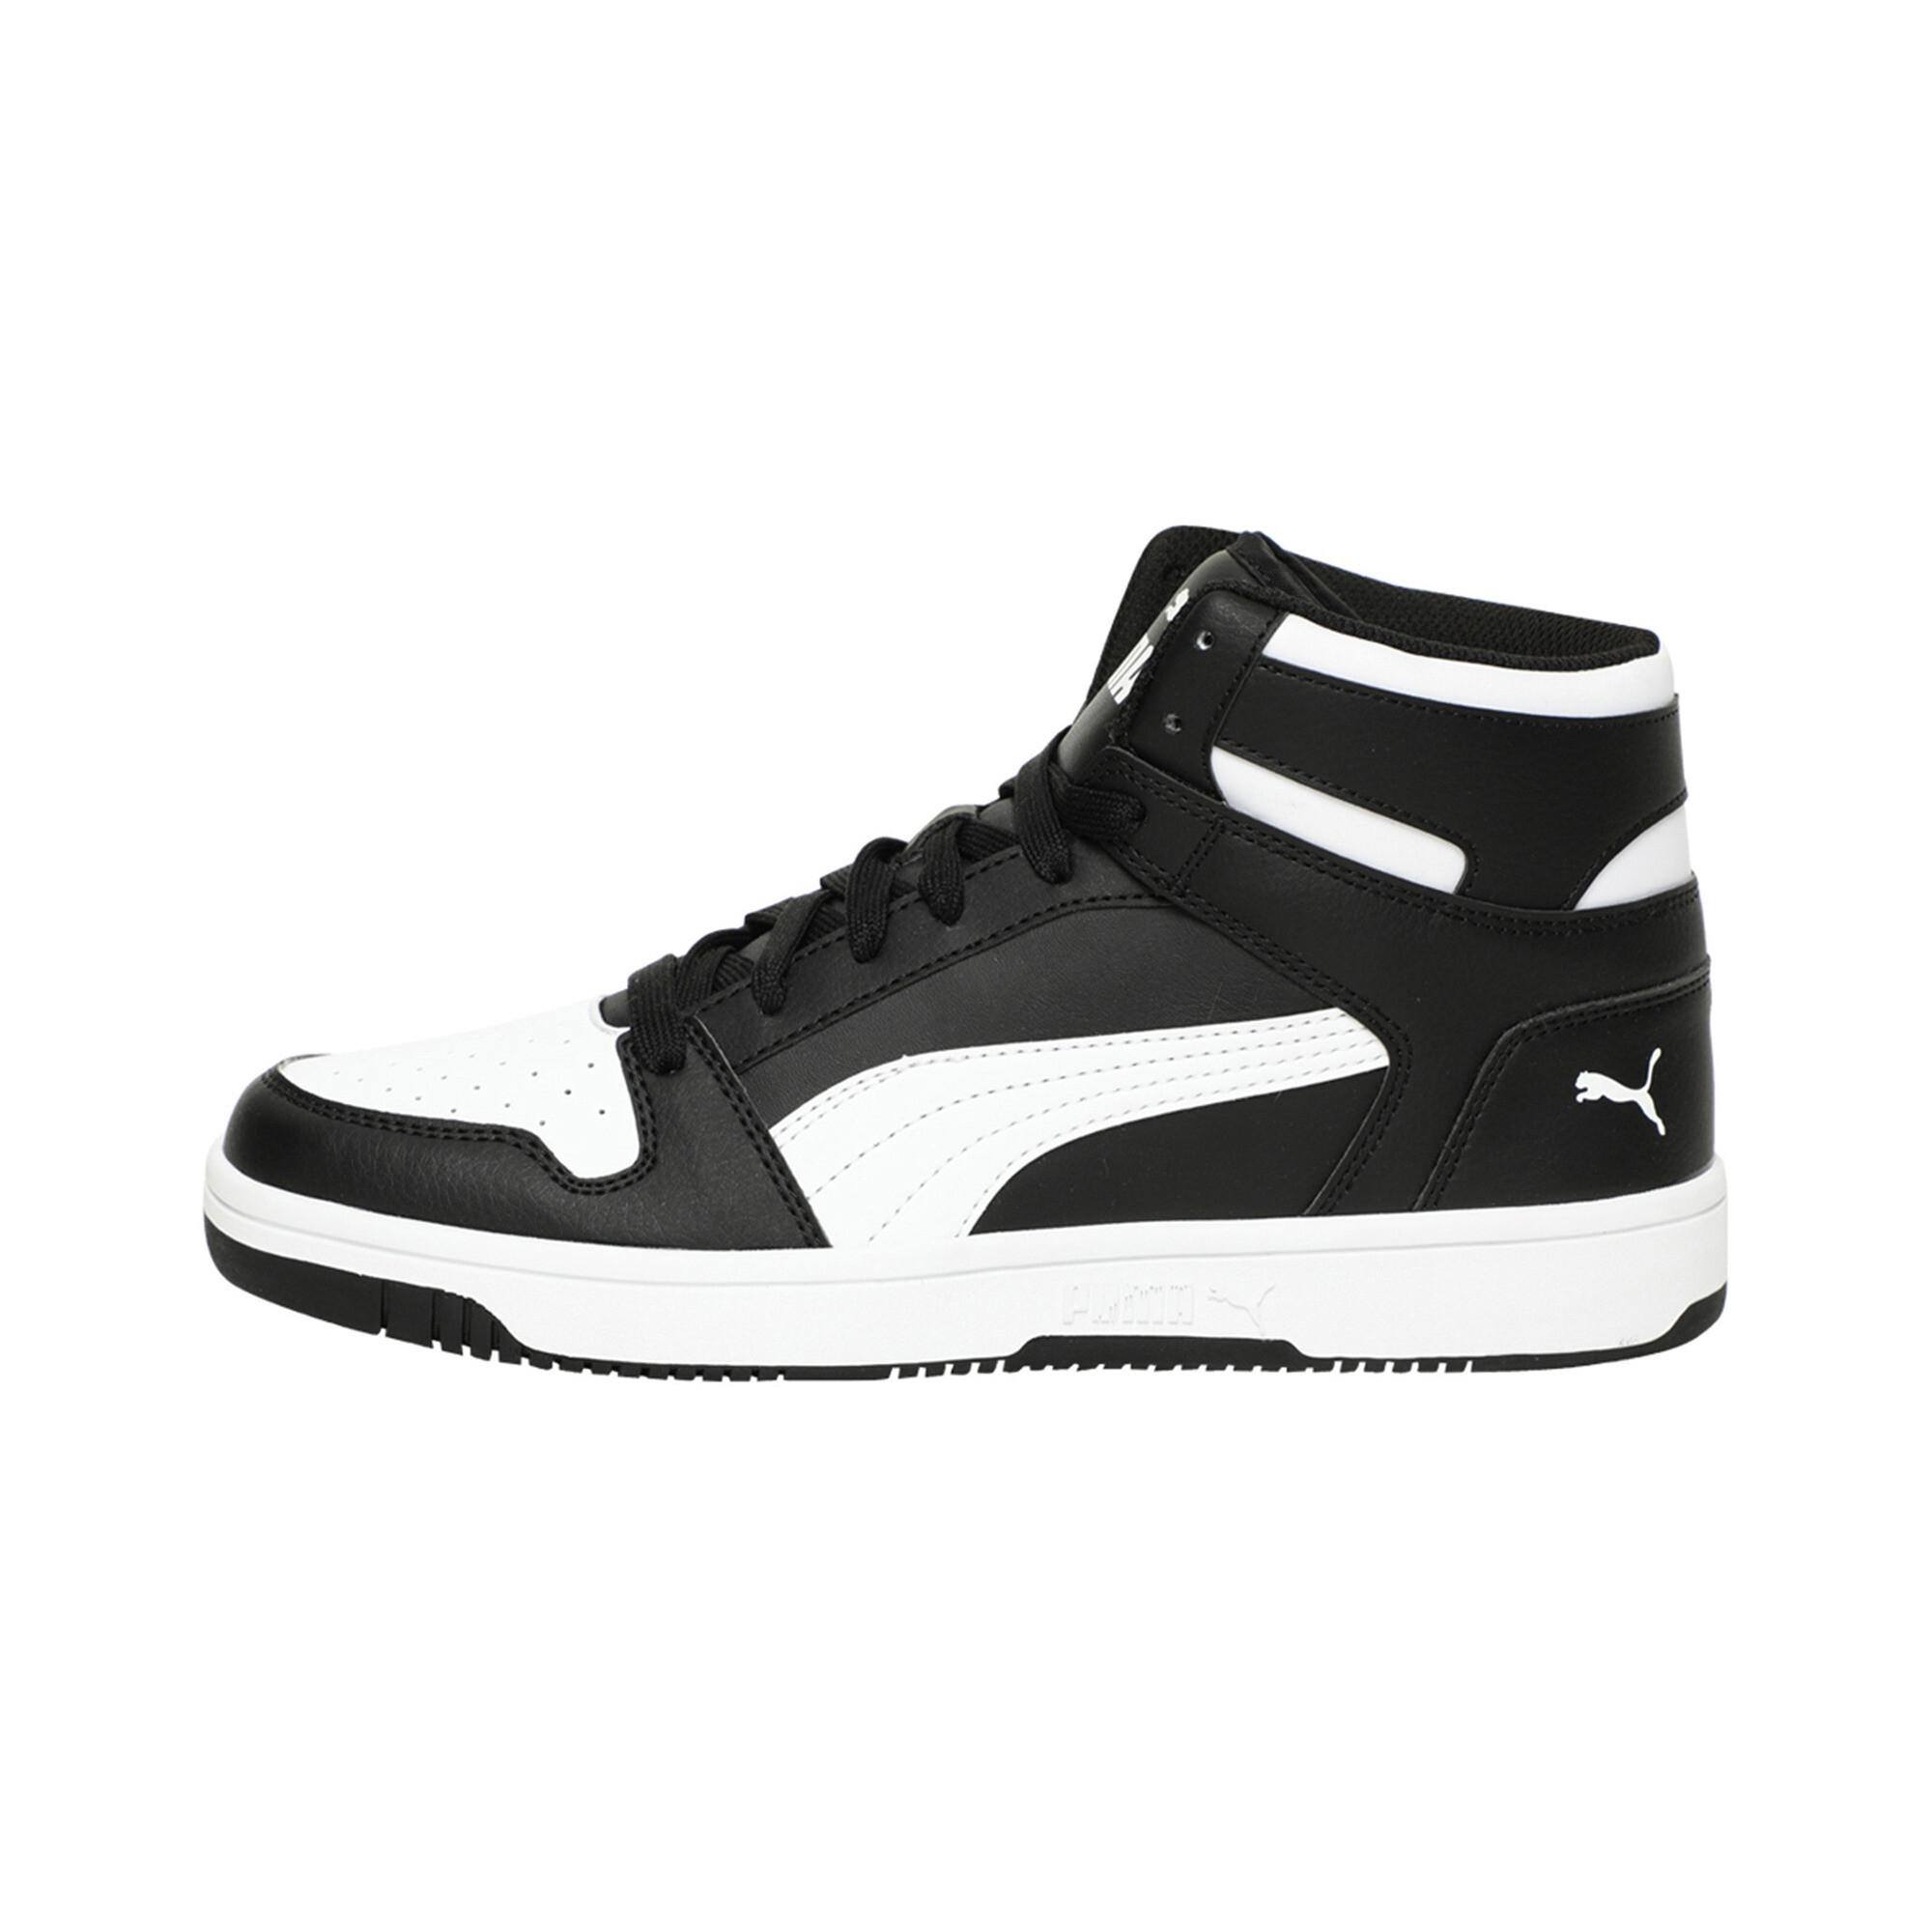 PUMA-PUMA-Rebound-LayUp-Men-039-s-Sneakers-Men-Mid-Boot-Basics thumbnail 4